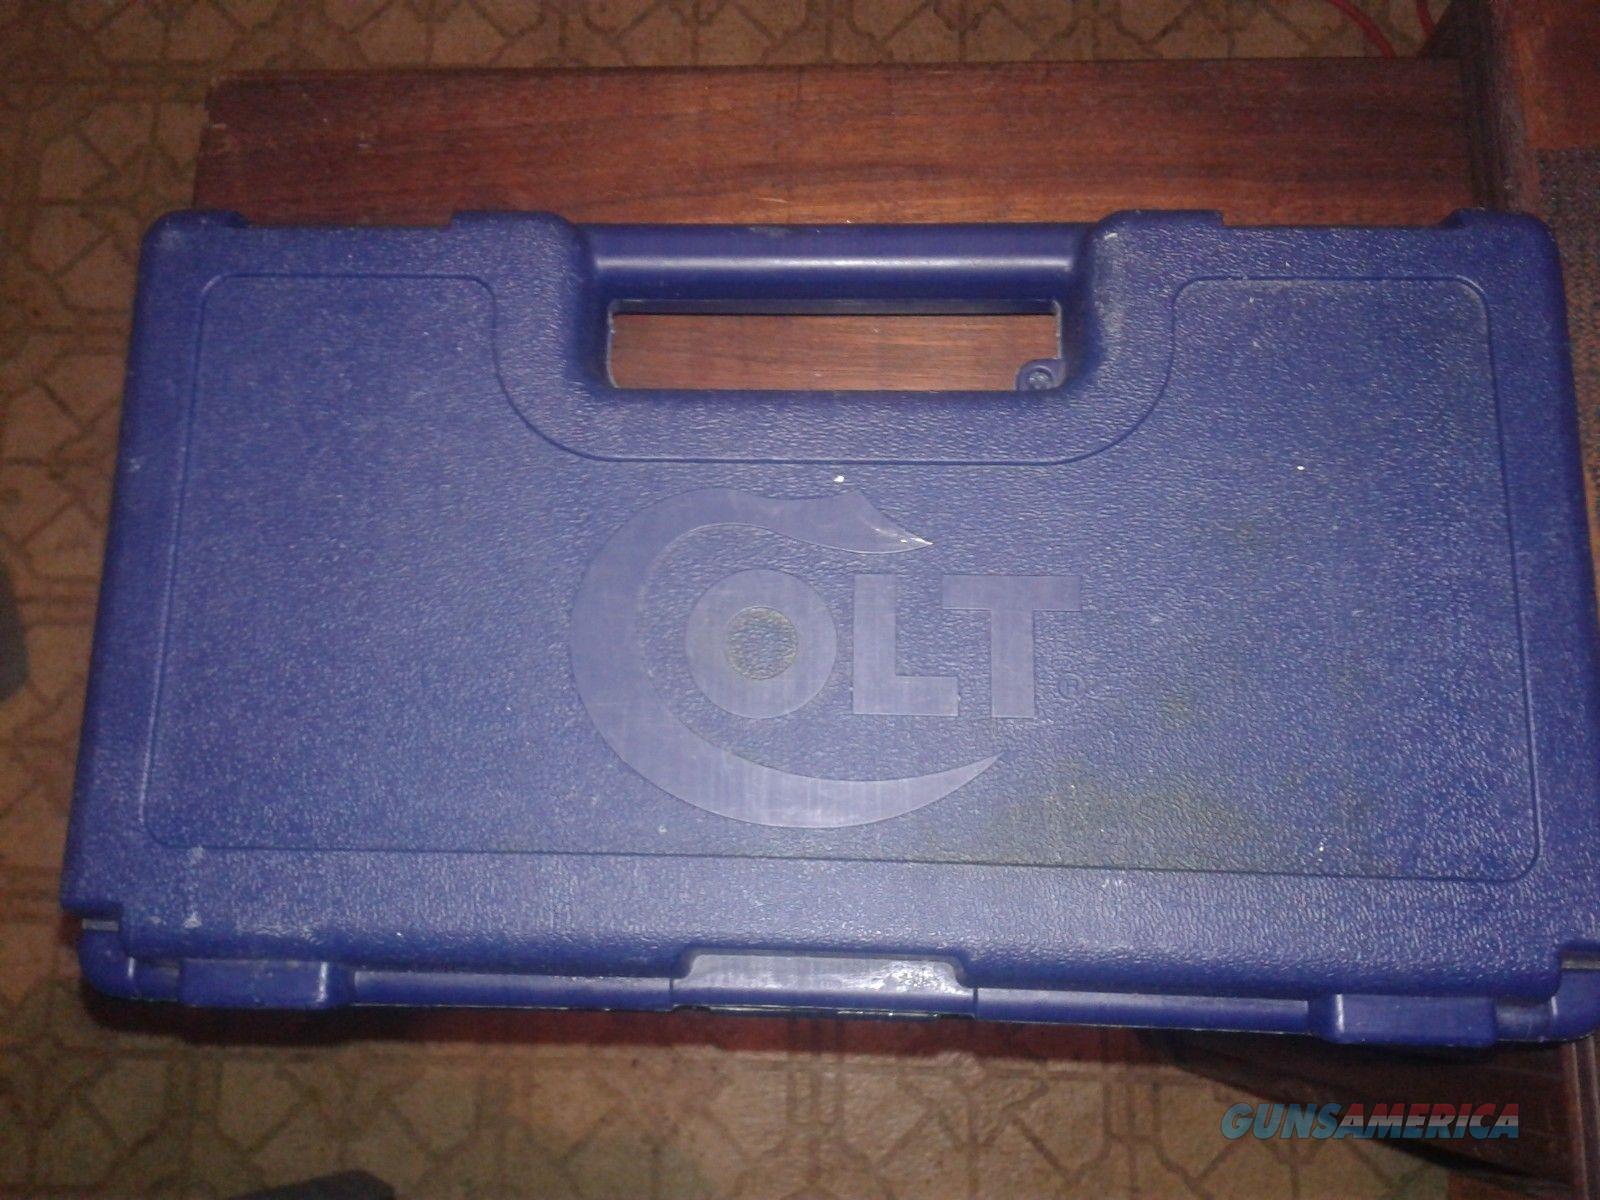 Colt Original Case fits Anaconda, Python Revolvers Colt Fireams  Non-Guns > Gun Cases